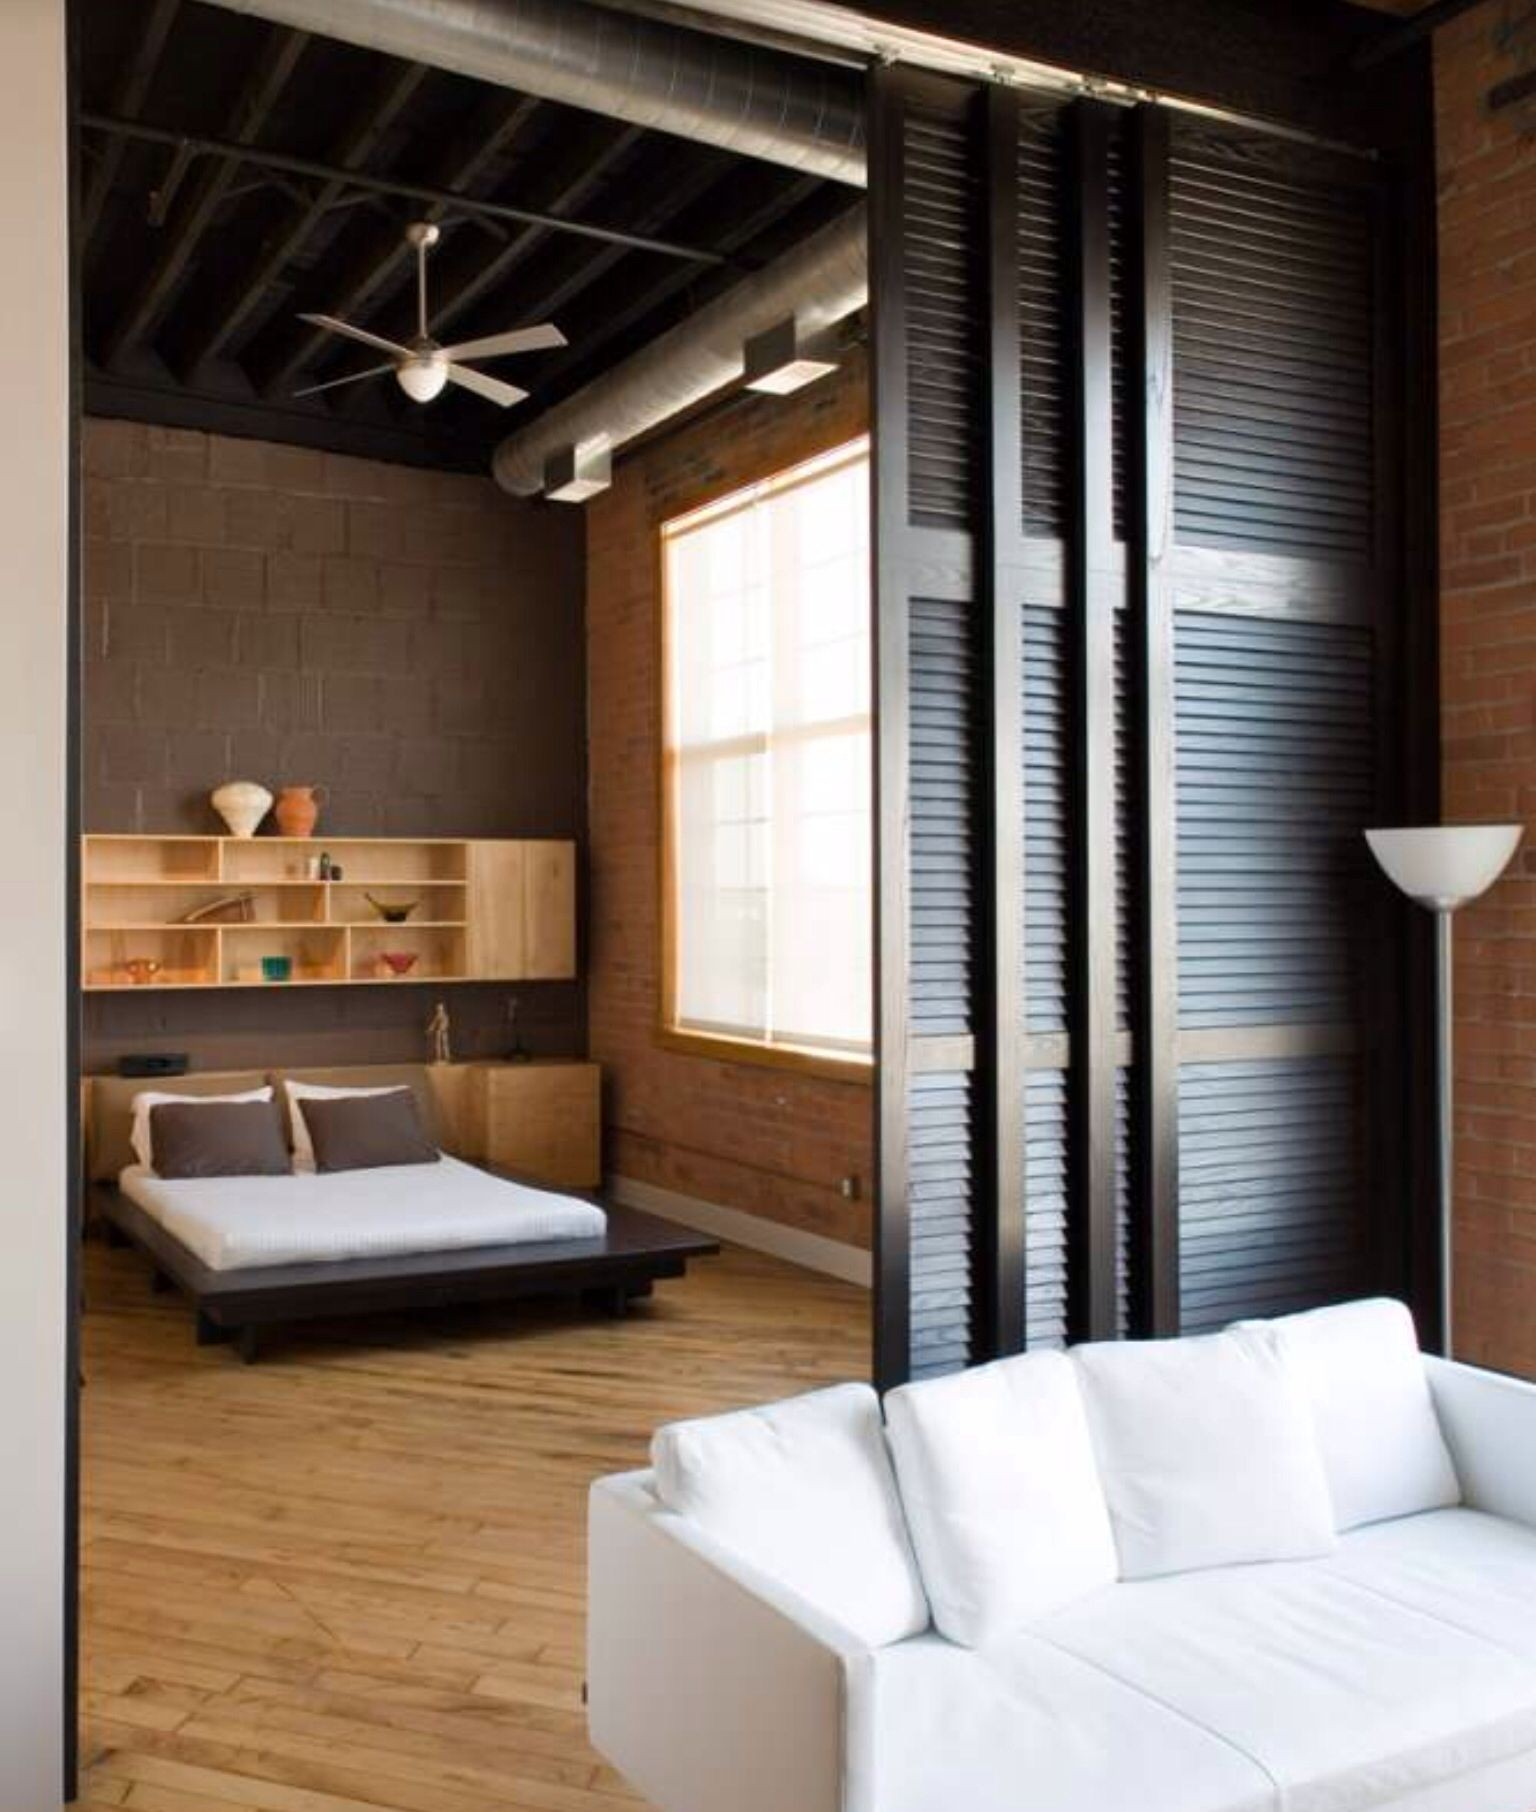 Beau How To Divide A Studio Apartment